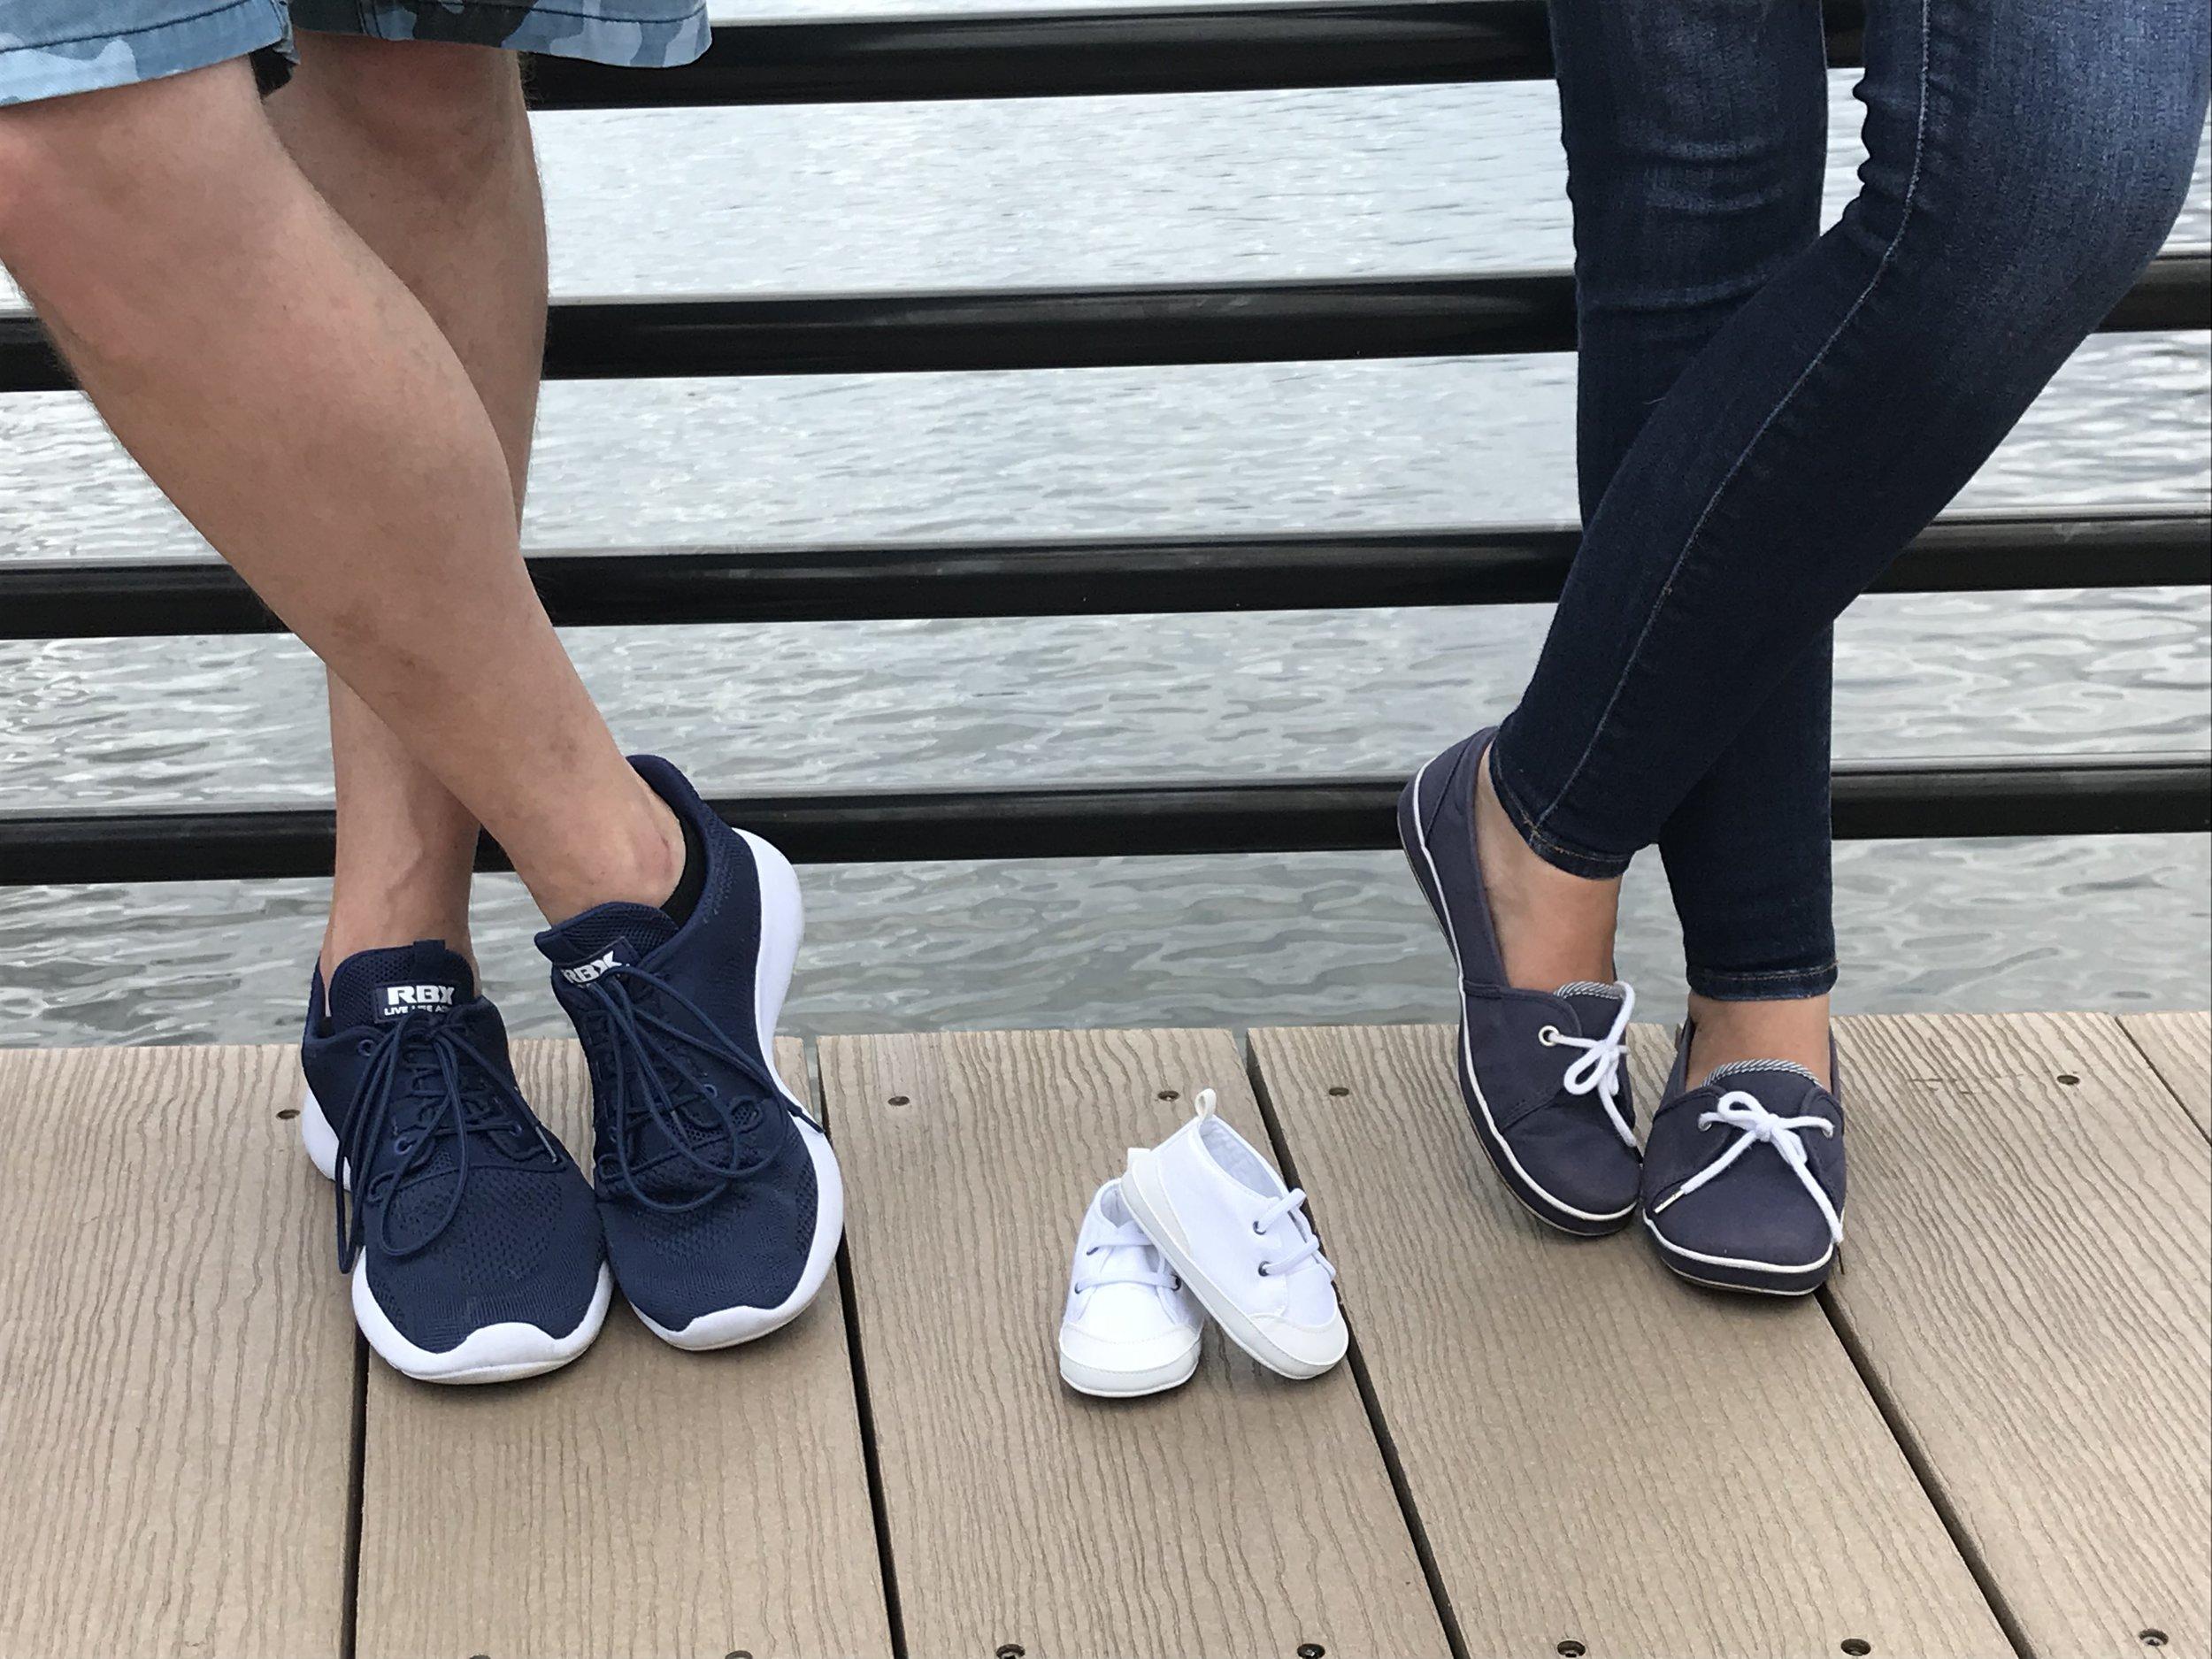 Melissa Nick adopting adopt adoptive parents birth mother open adoption